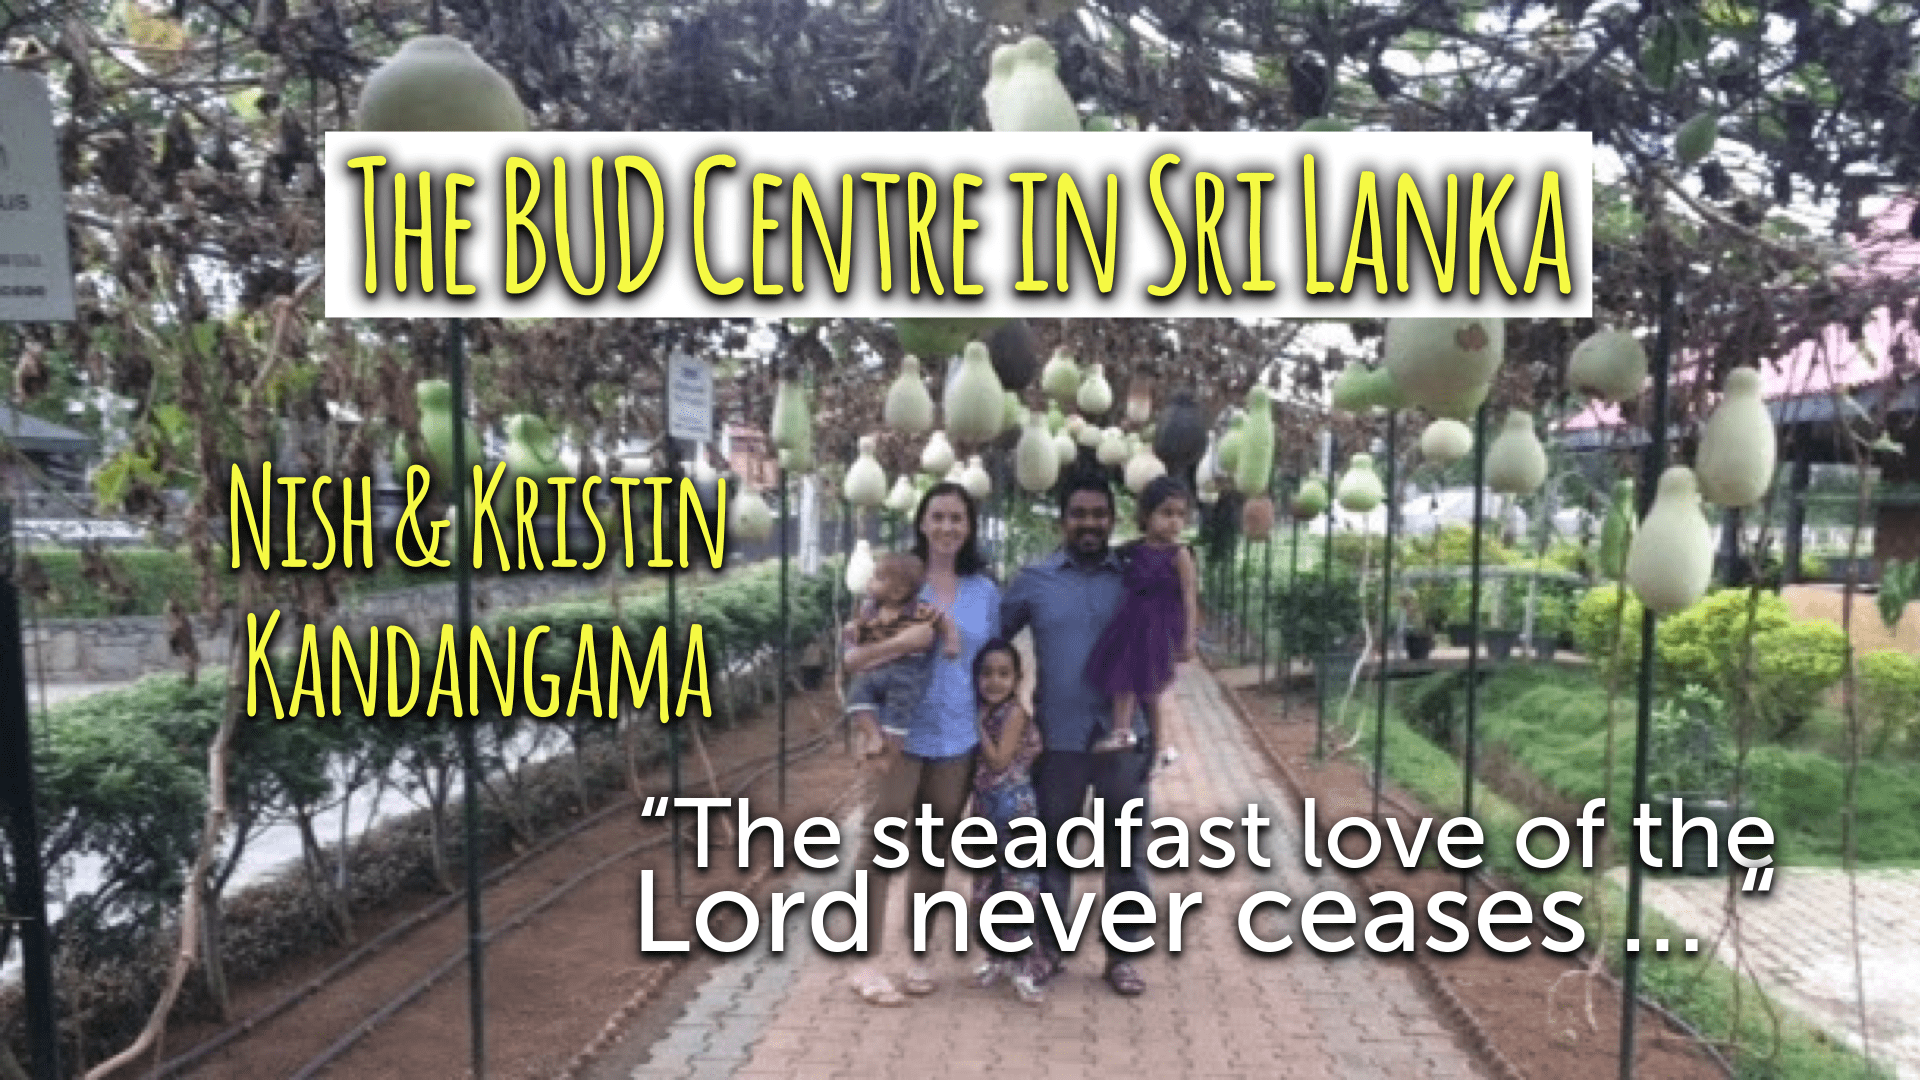 BUD Centre Sri Lanka